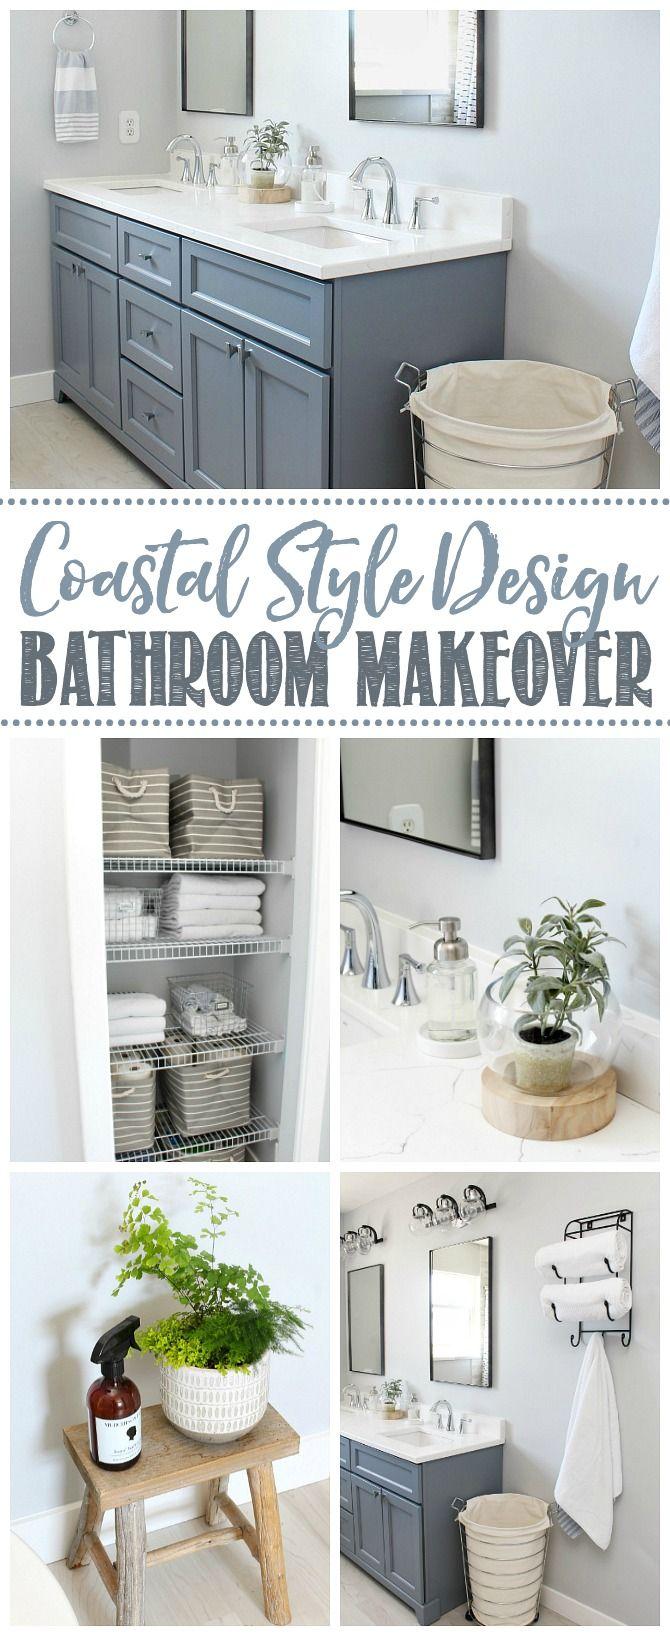 Coastal Style Bathroom Makeover | Coastal style bathroom ...